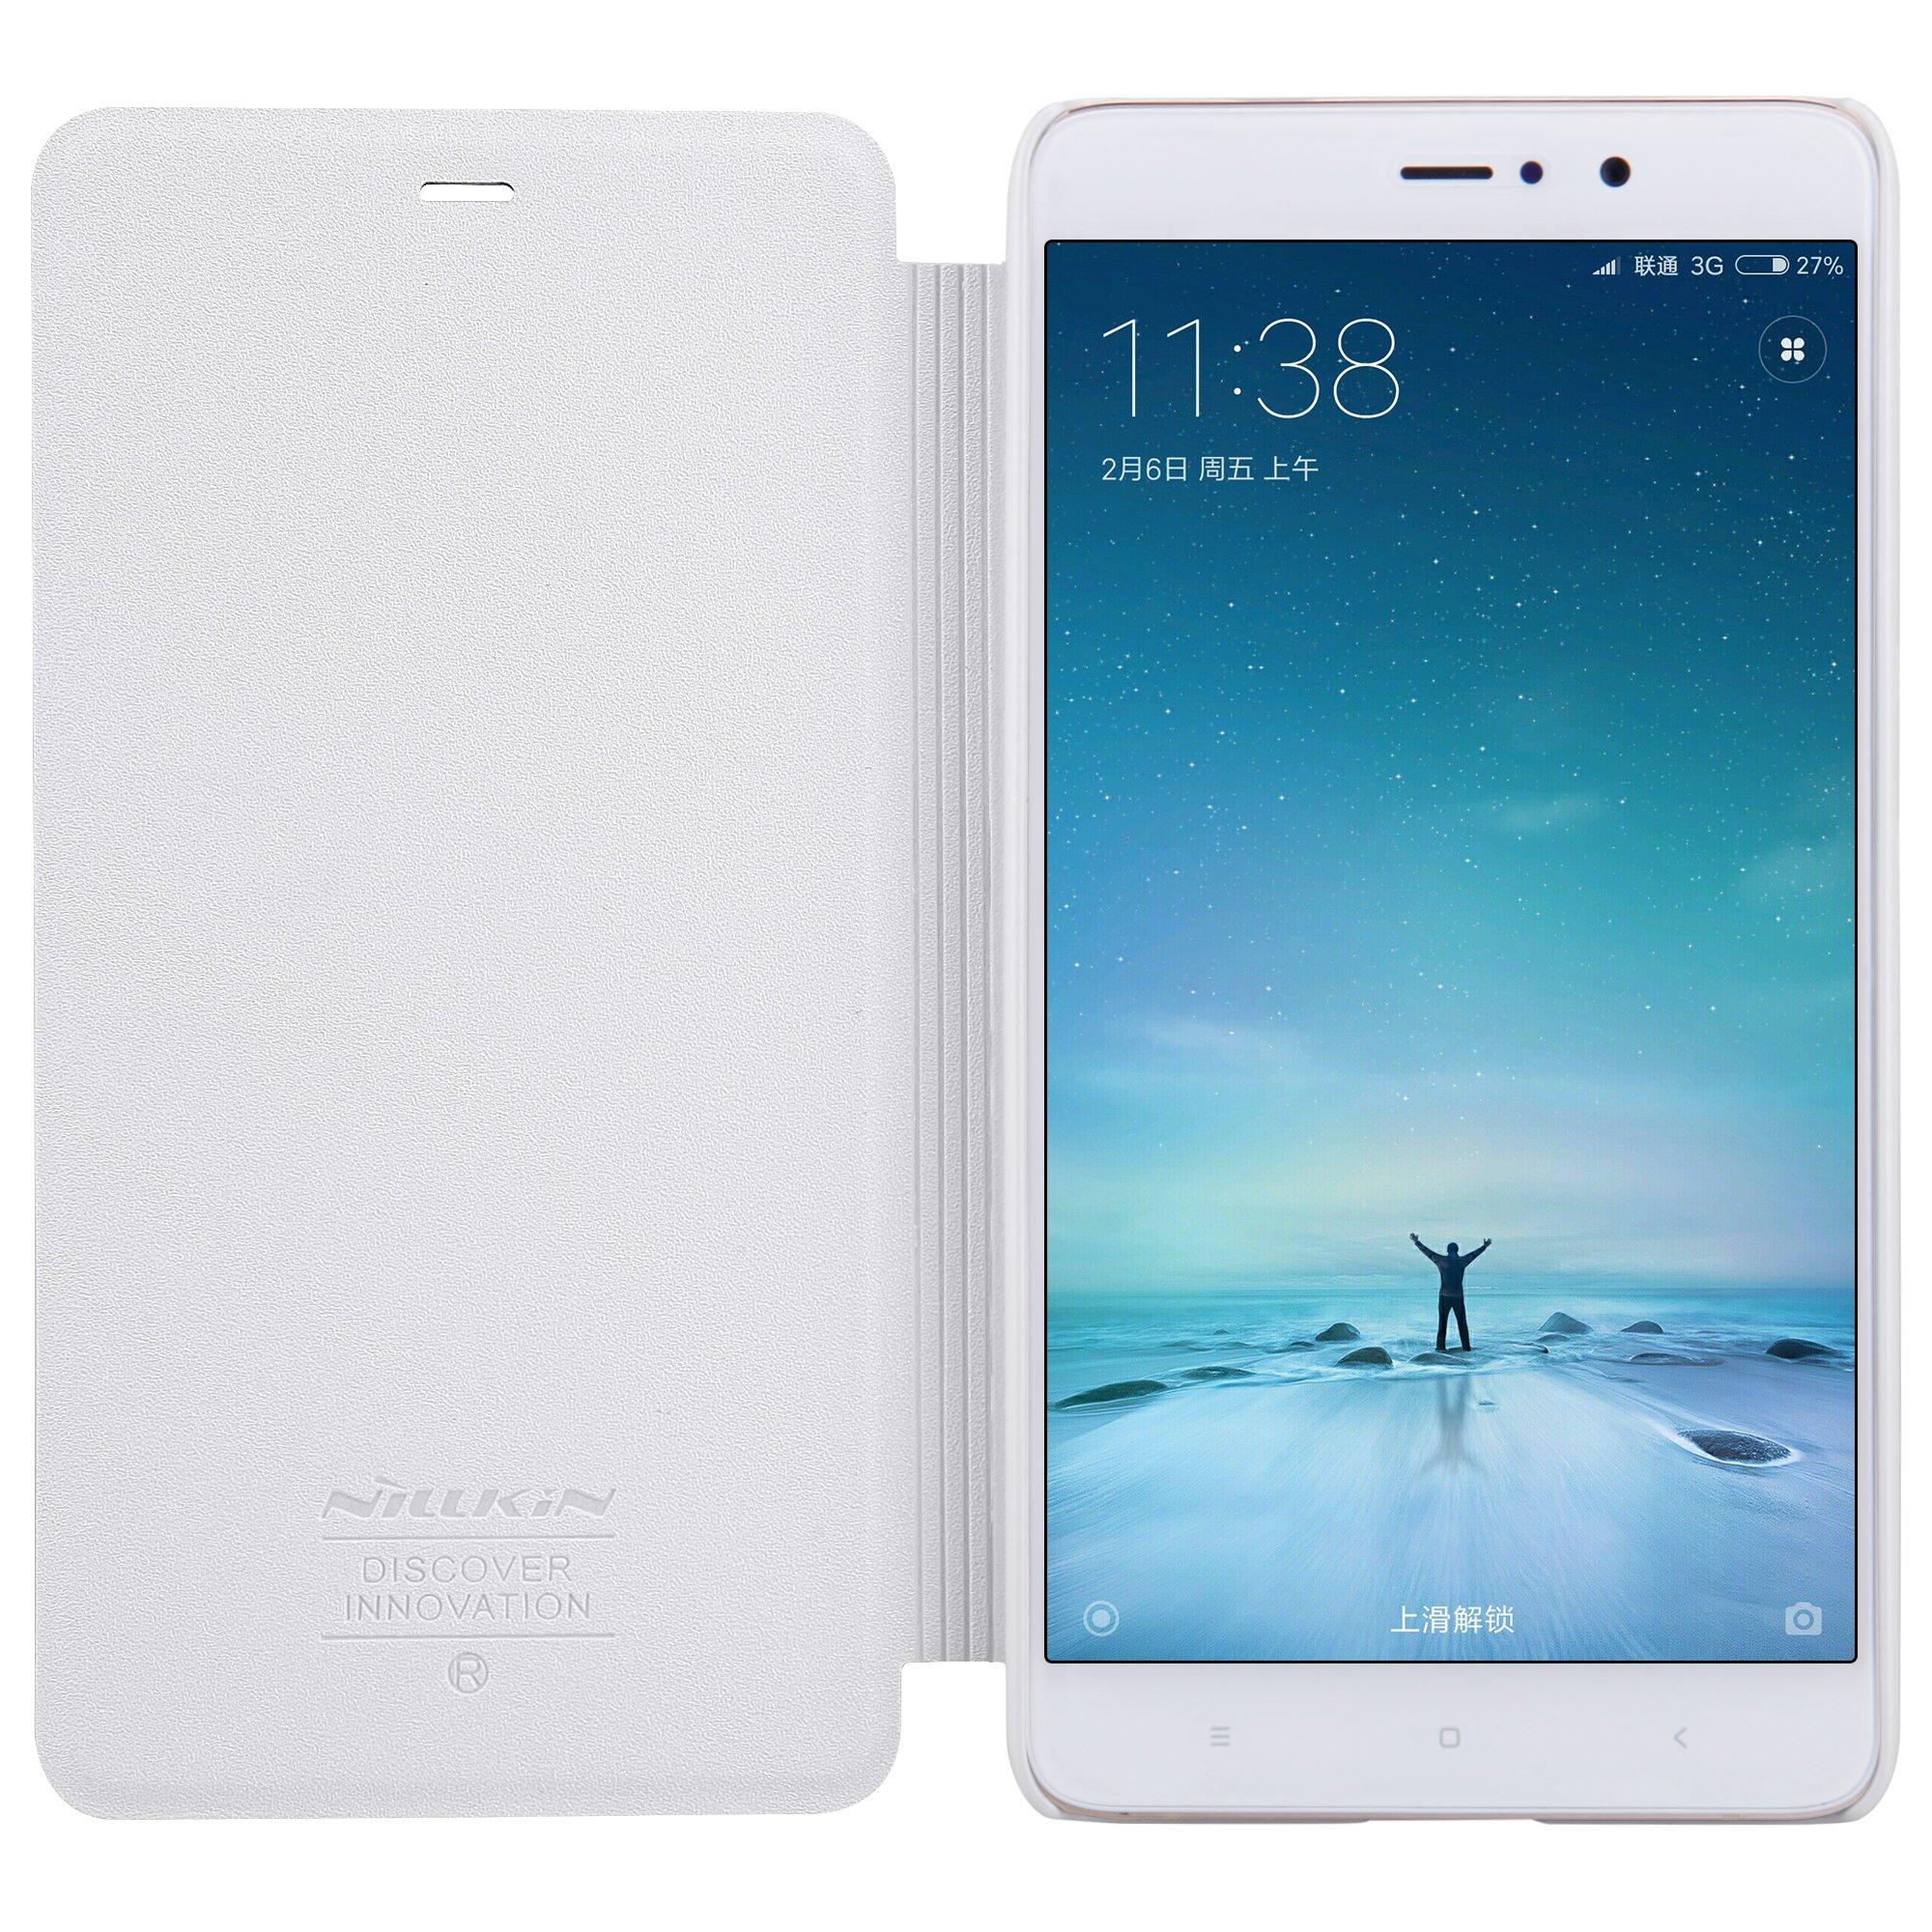 PU Cuero para Xiaomi Mi 5S plus Difícil Custodia ,BiLi® Libre de contaminación PU Cuero + PC Difícil Shell Super Slim Perfect Fit Premium Hard Protettiva Custodia: Amazon.es: Electrónica